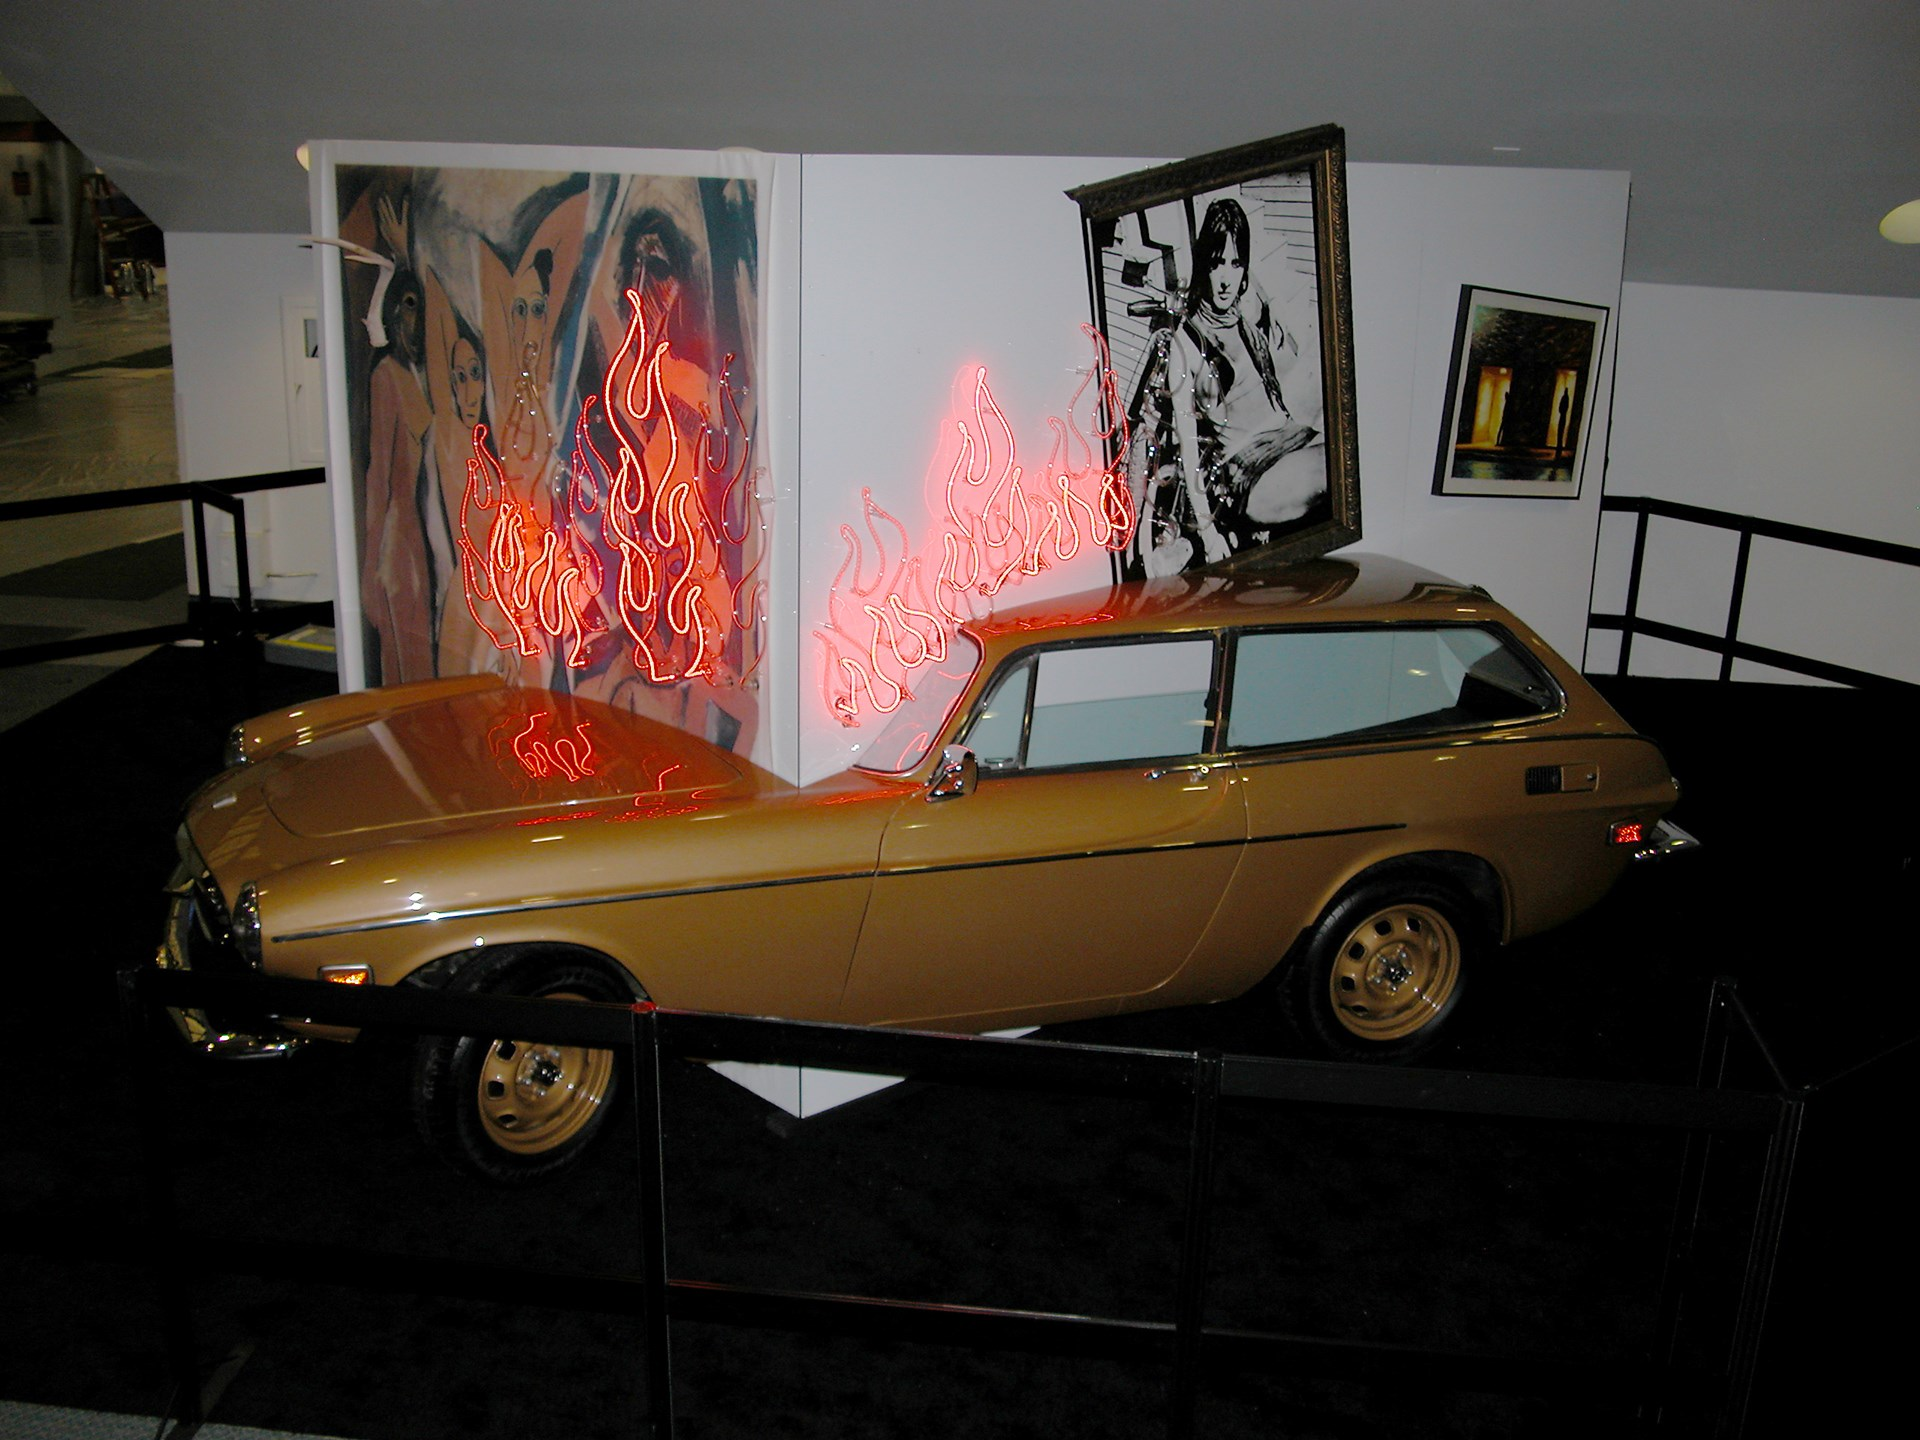 Body Heat - Crashing the Modern by Lili Lakich and Juan Larios, 2005